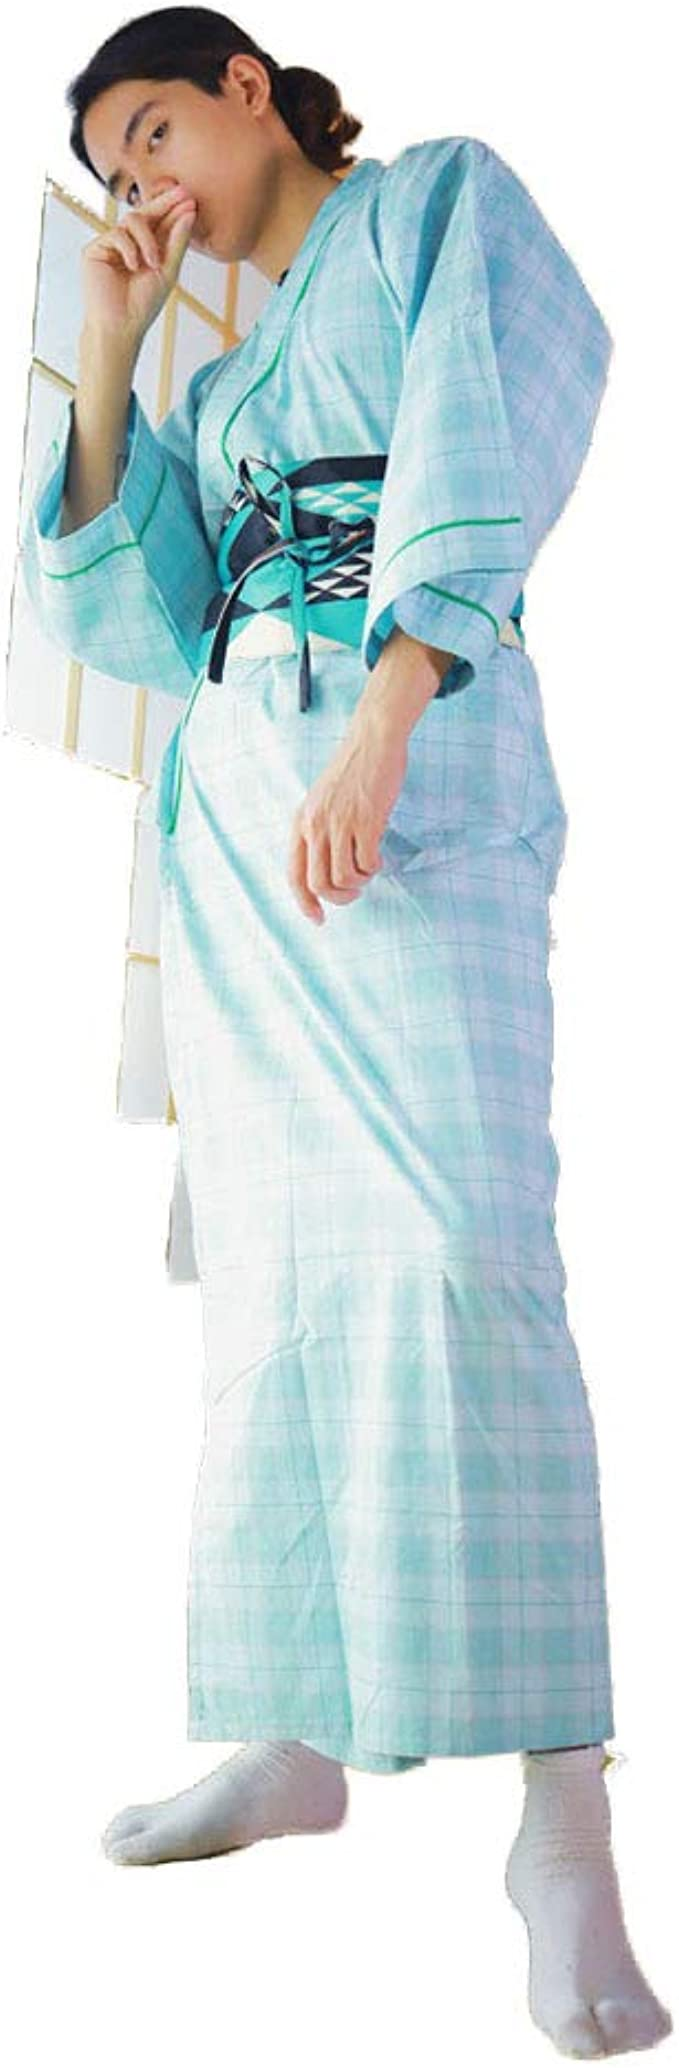 EXPRESS DELIVERY eagle Print Cotton l Bathrobe Kimono with bag Beach Wear Long Kimono Ethnic Women Wear Bathrobe Night Wear Robe